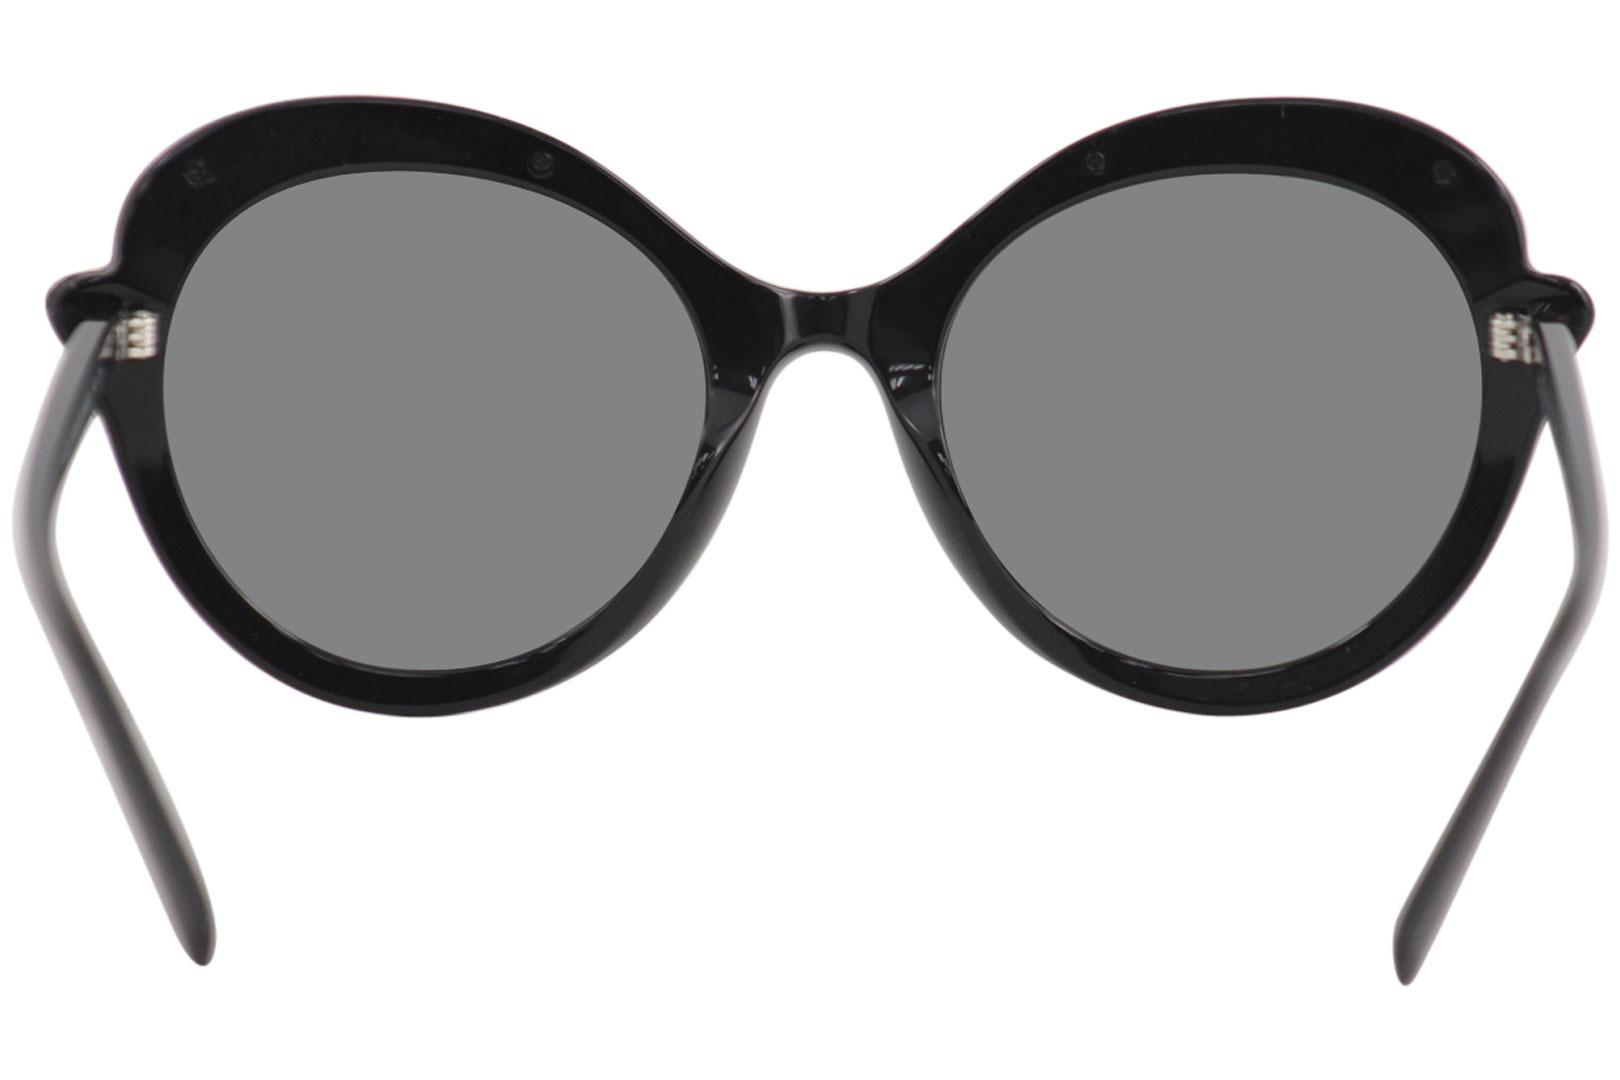 bbf597059aa3f Women s TF4155 TF 4155 Fashion Round Sunglasses by Tiffany   Co. 12345